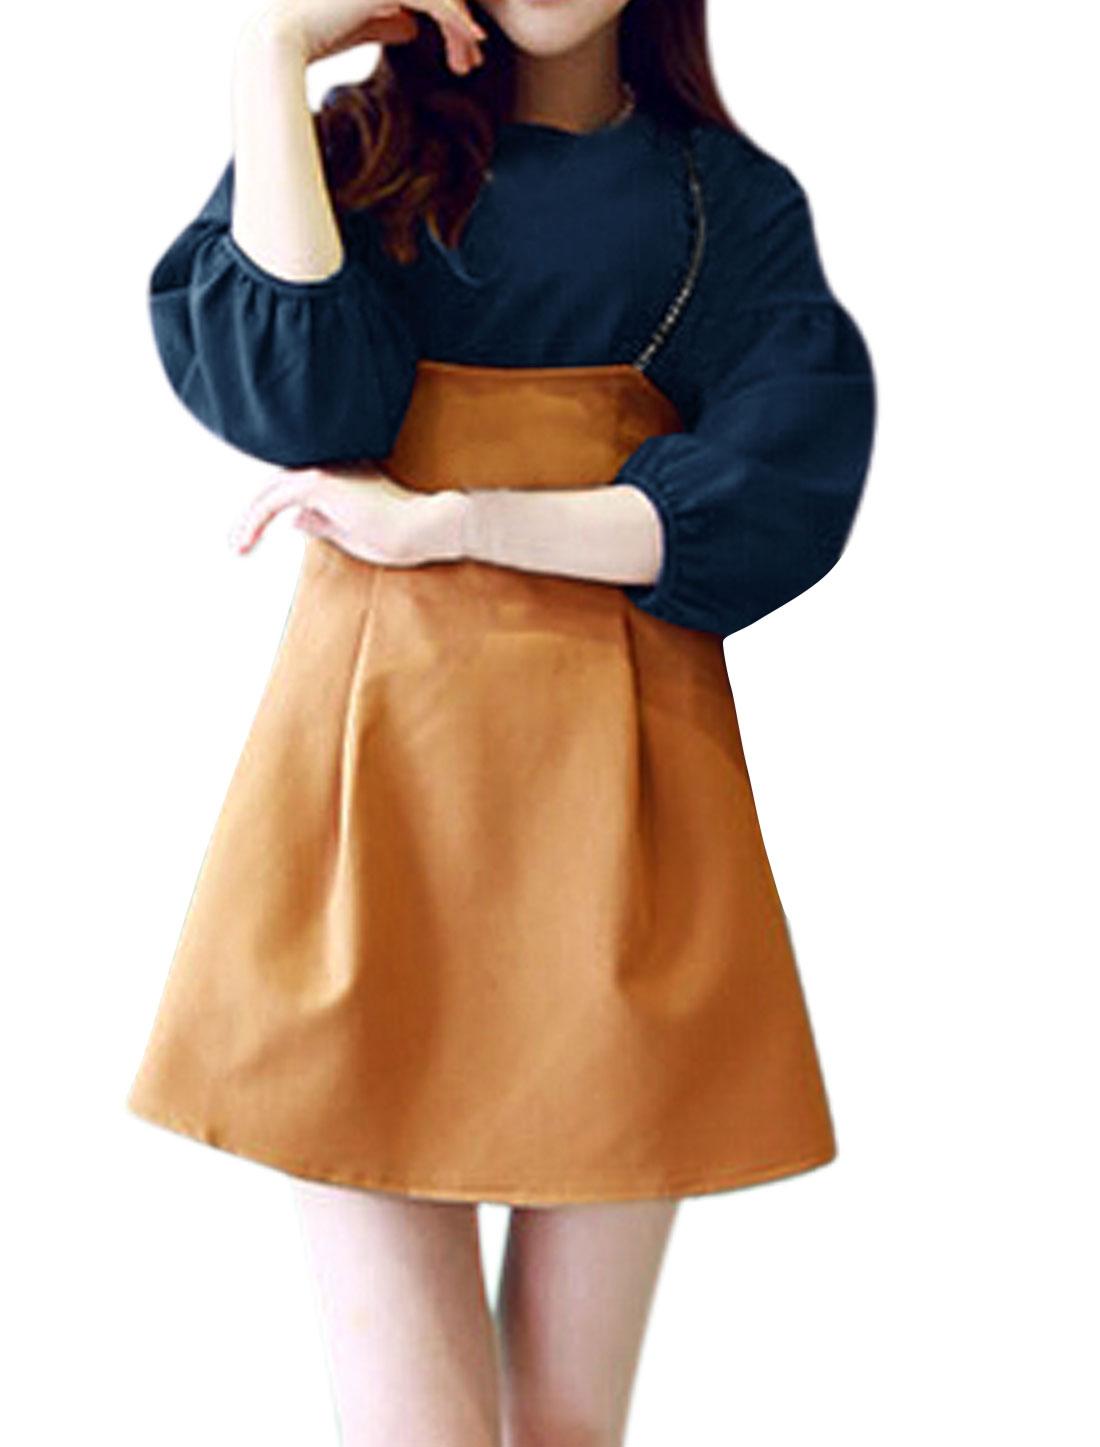 Women 3/4 Sleeves Top w Pleated Suspender Dress Sets Blue Brown S